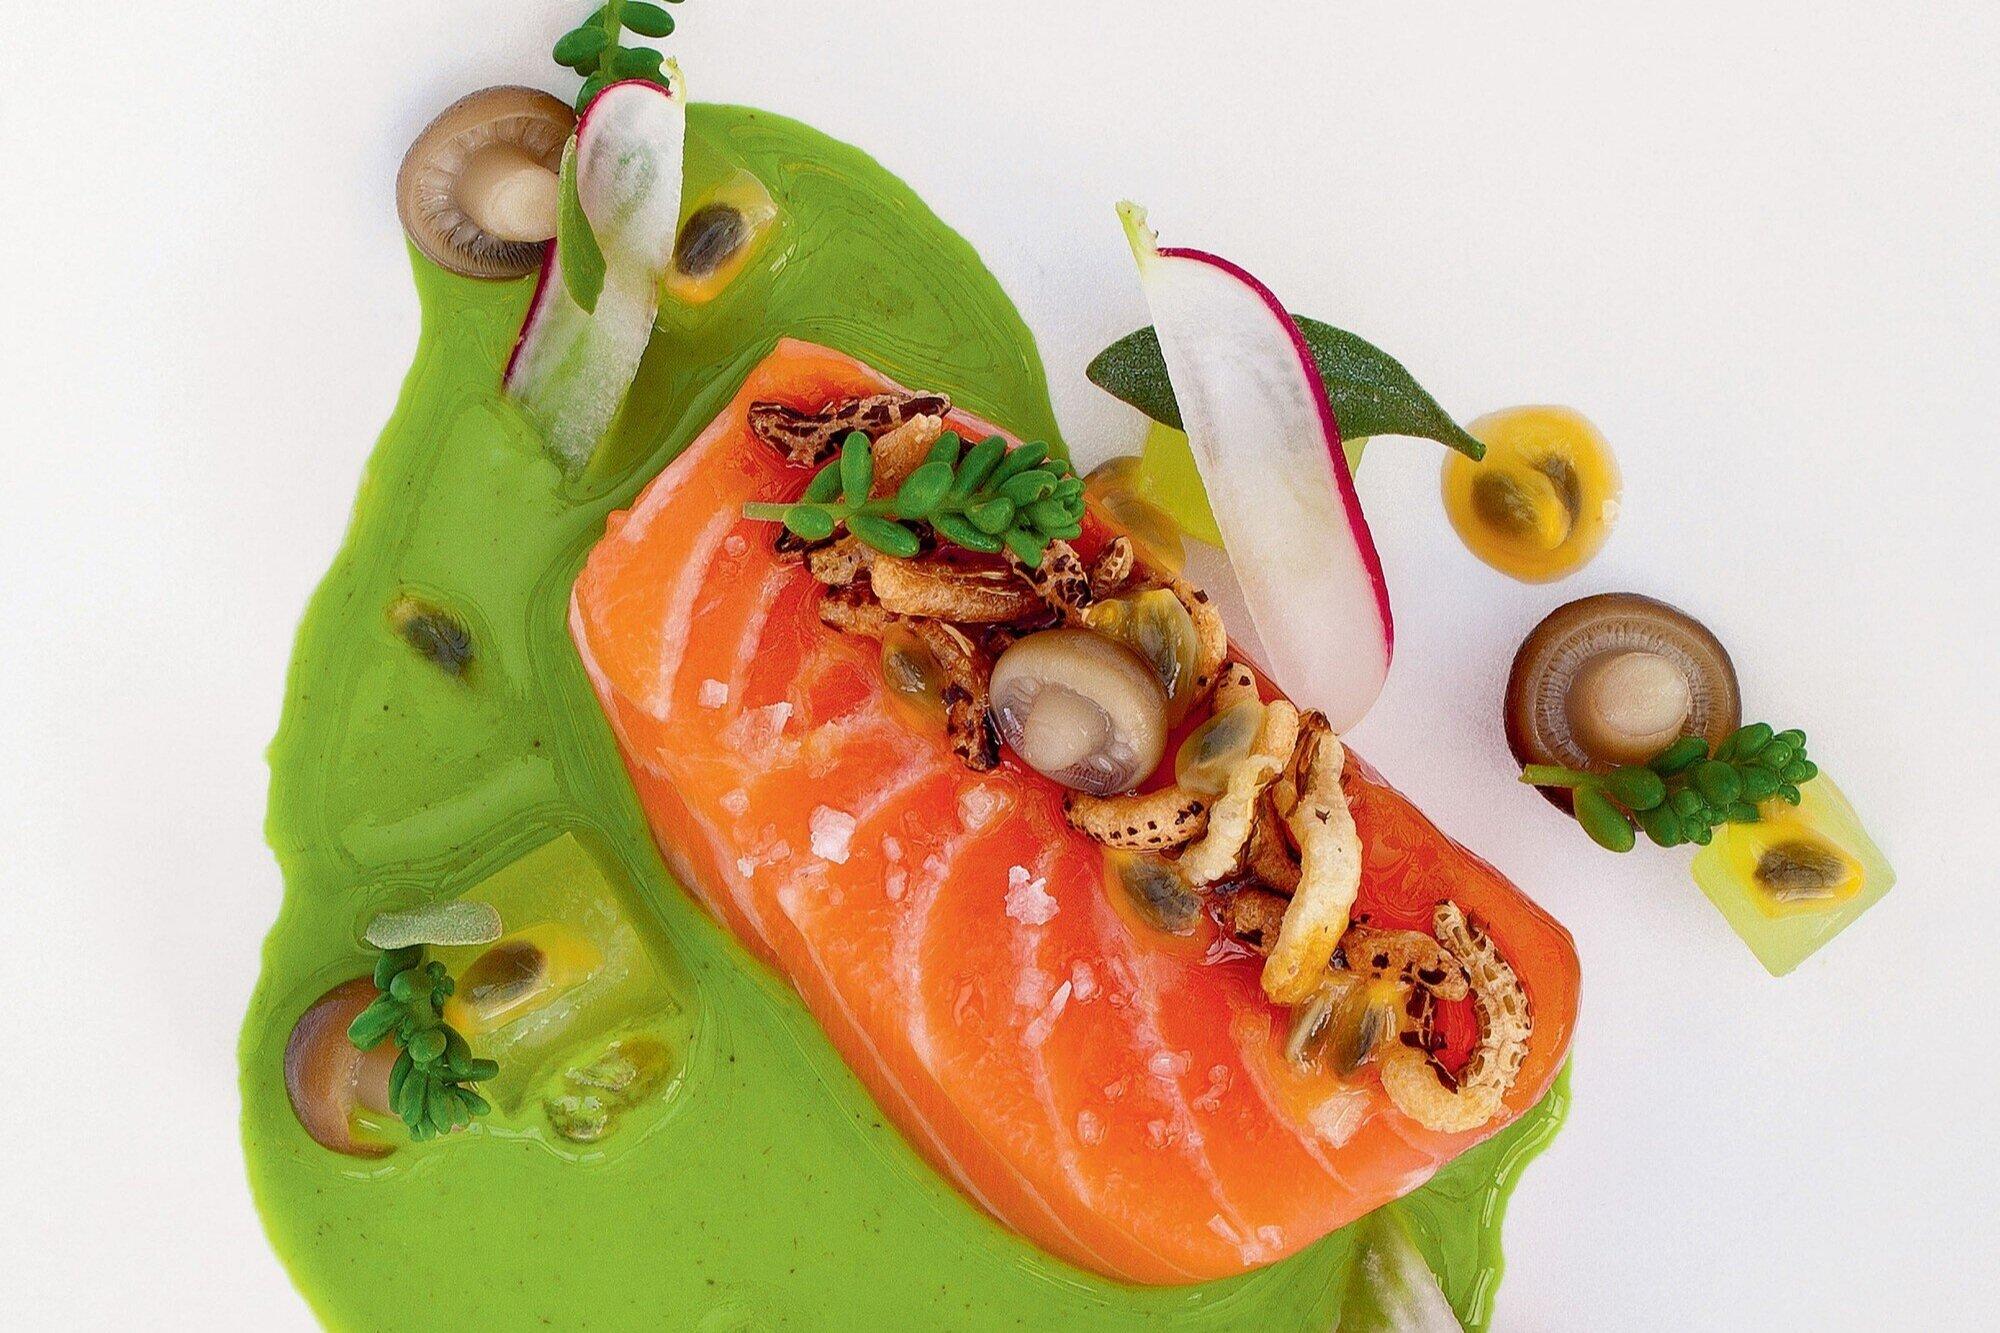 Cookbooks with Michelin-star status